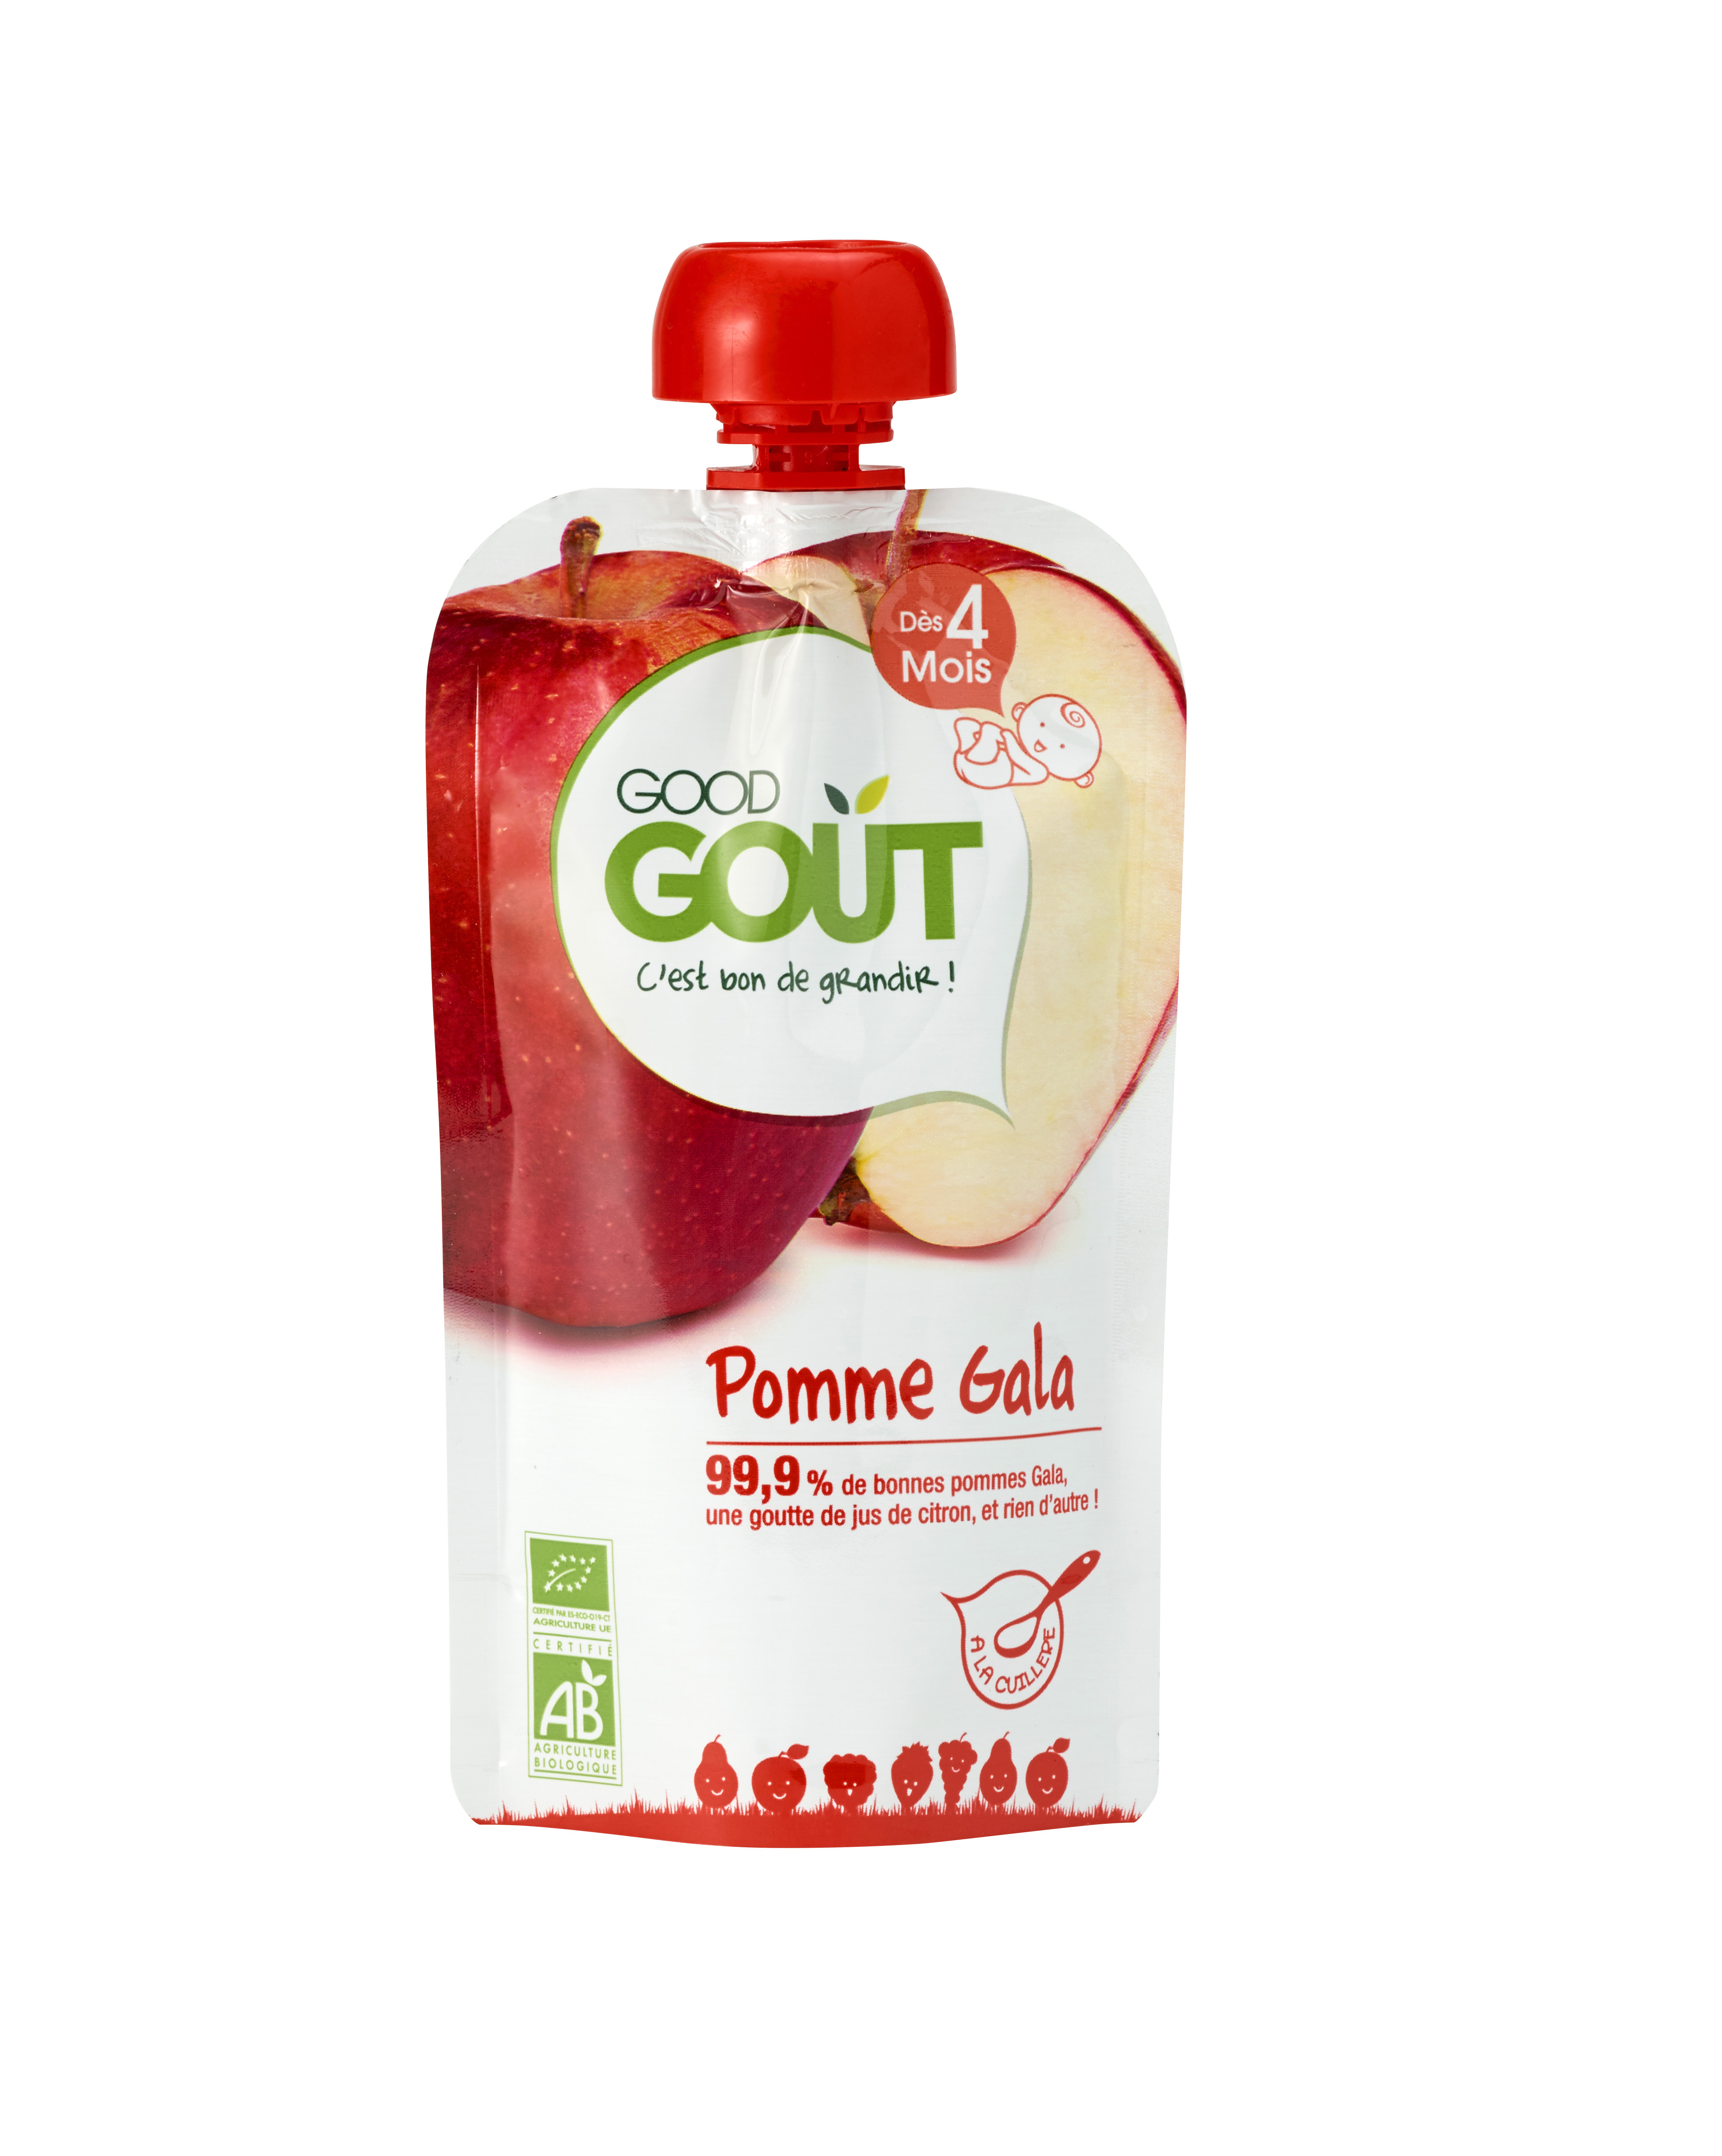 Good Gourde Pomme Gala BIO, Good Goût (120 g) - dès 4 mois